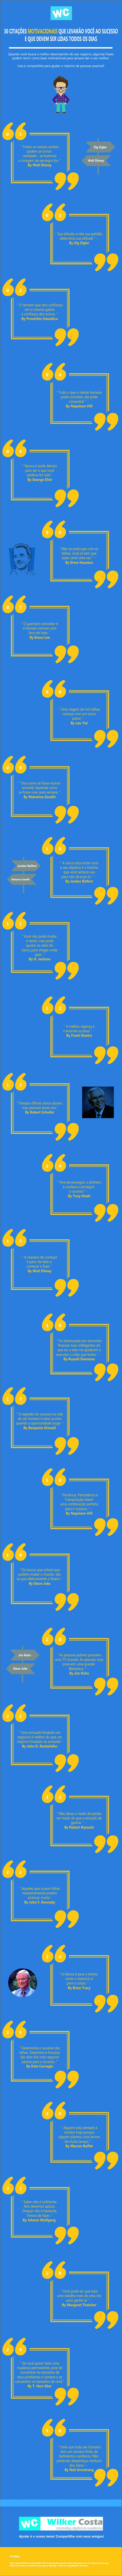 frases motivacionais para empreendedores